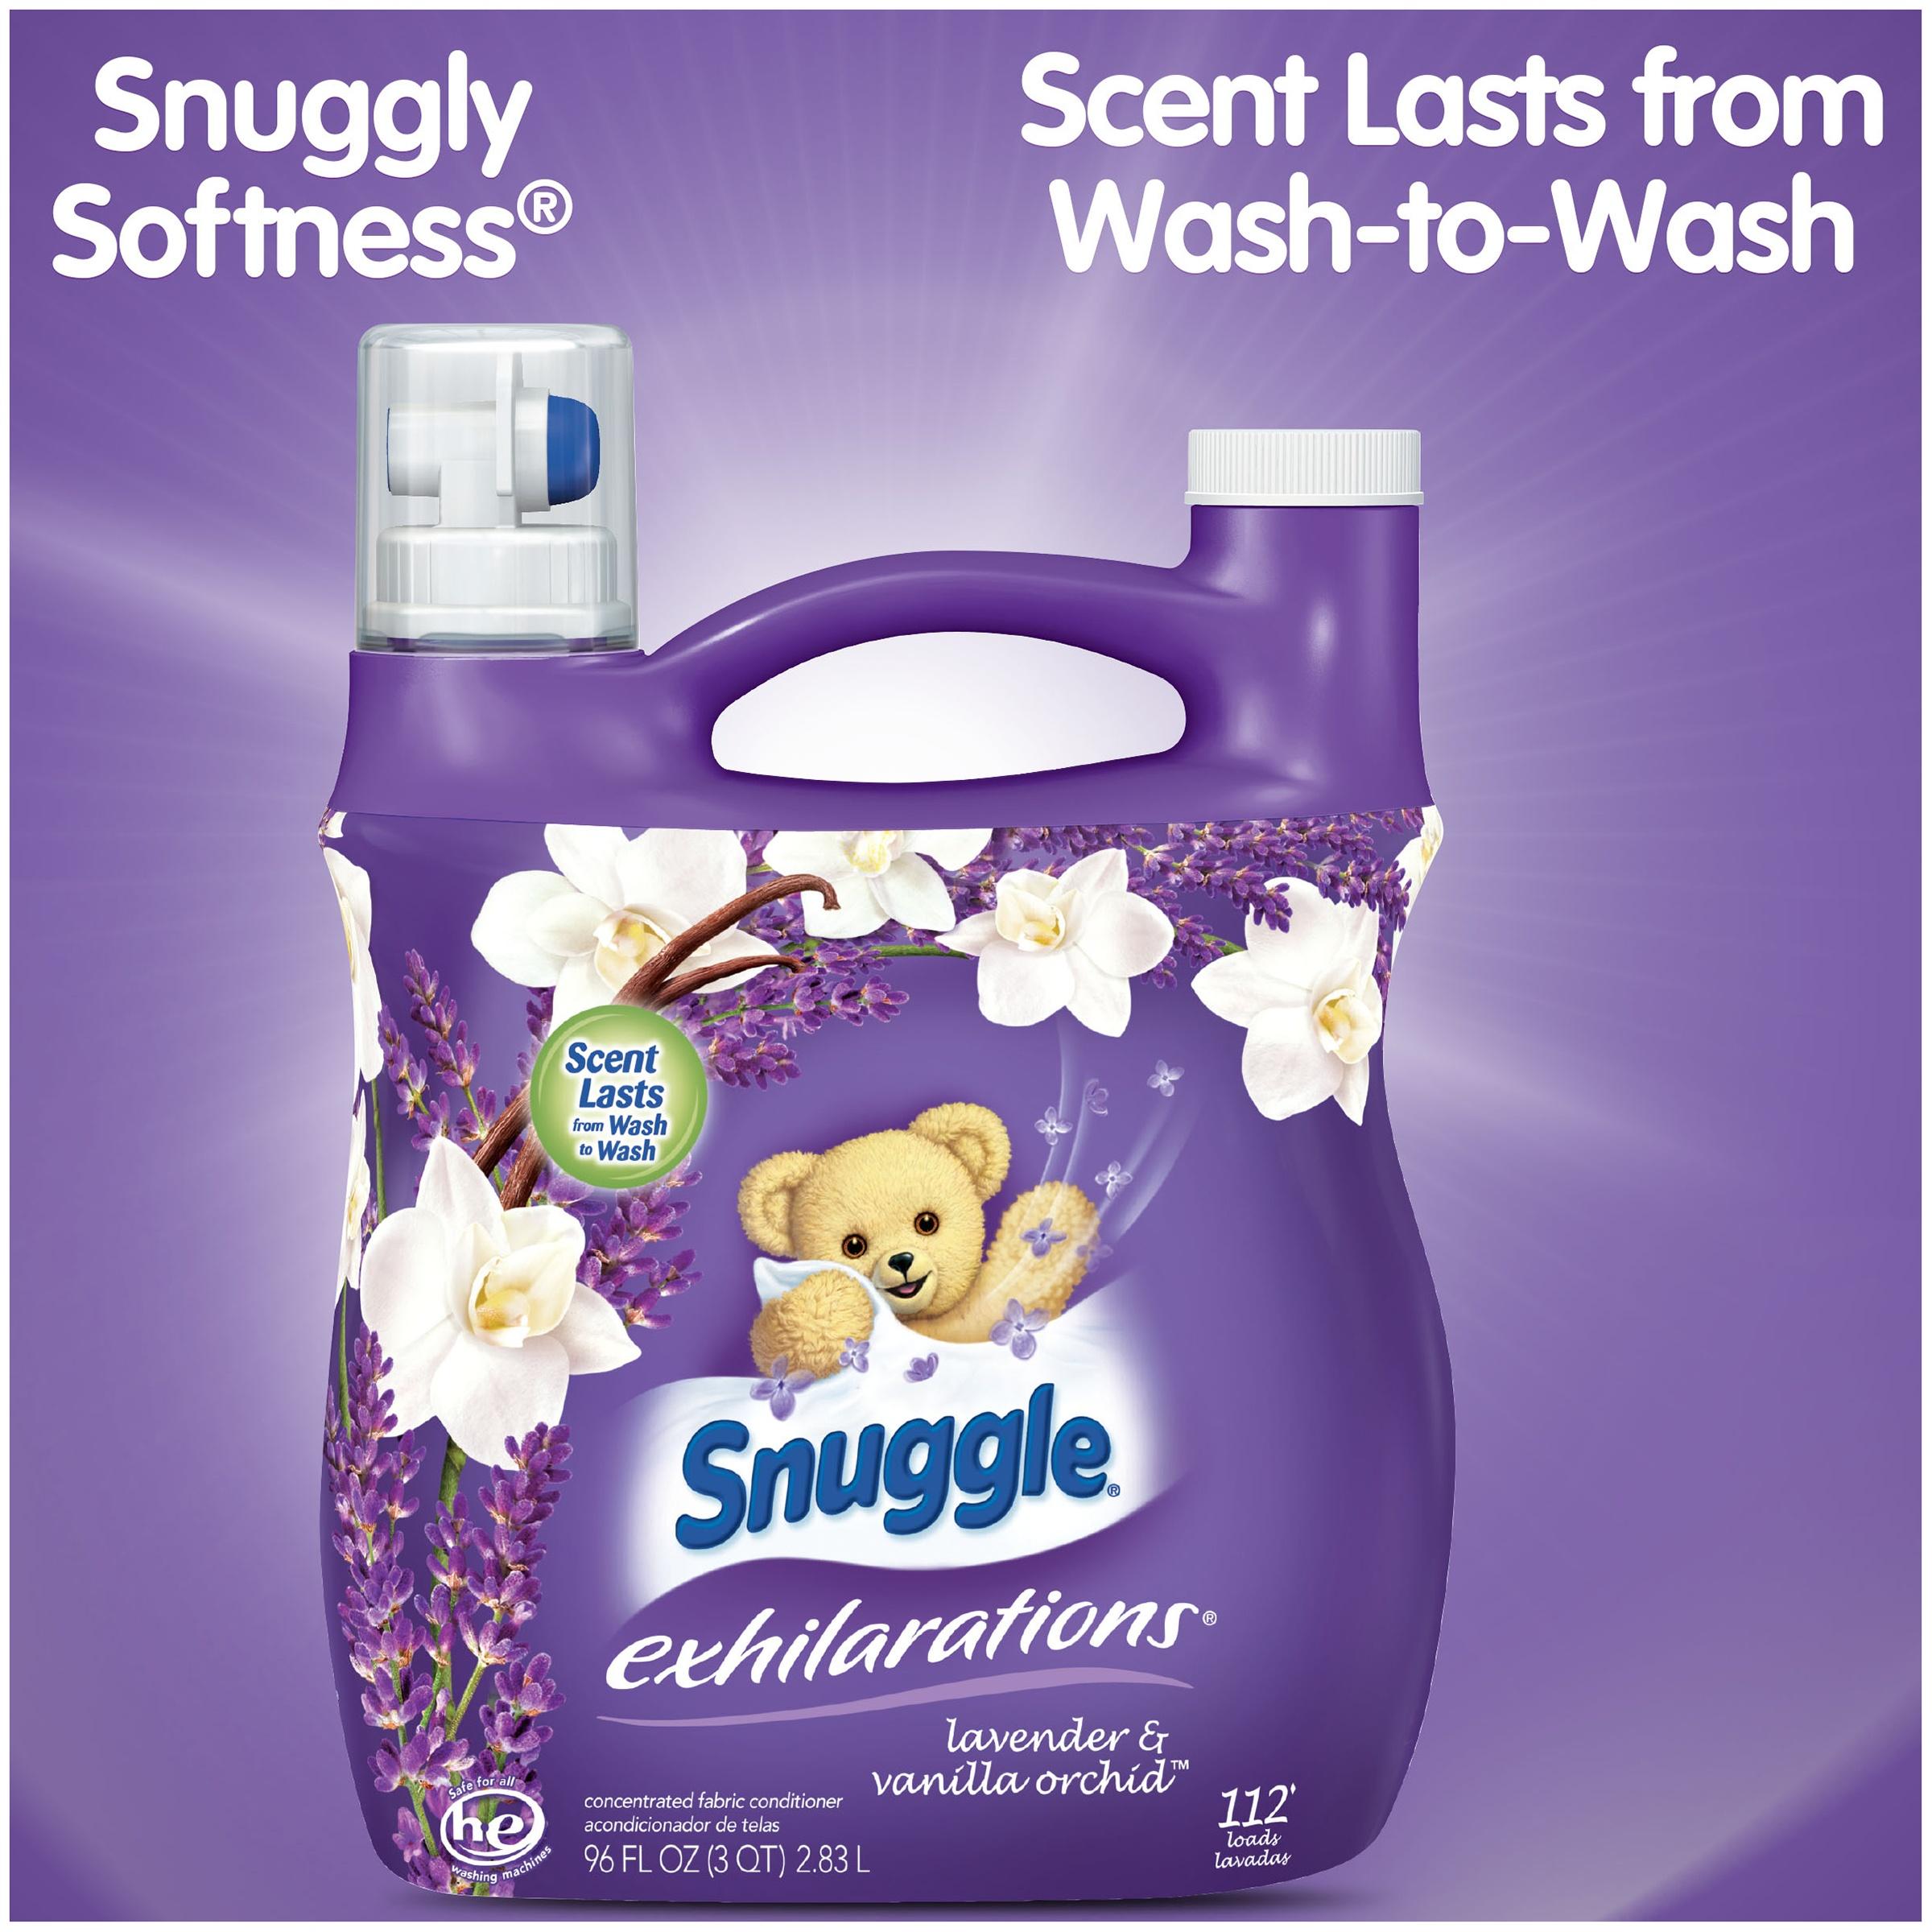 Snuggle Exhilarations Lavender & Vanilla Orchid, 112 Loads Liquid Fabric Softener 96 fl oz $5.97